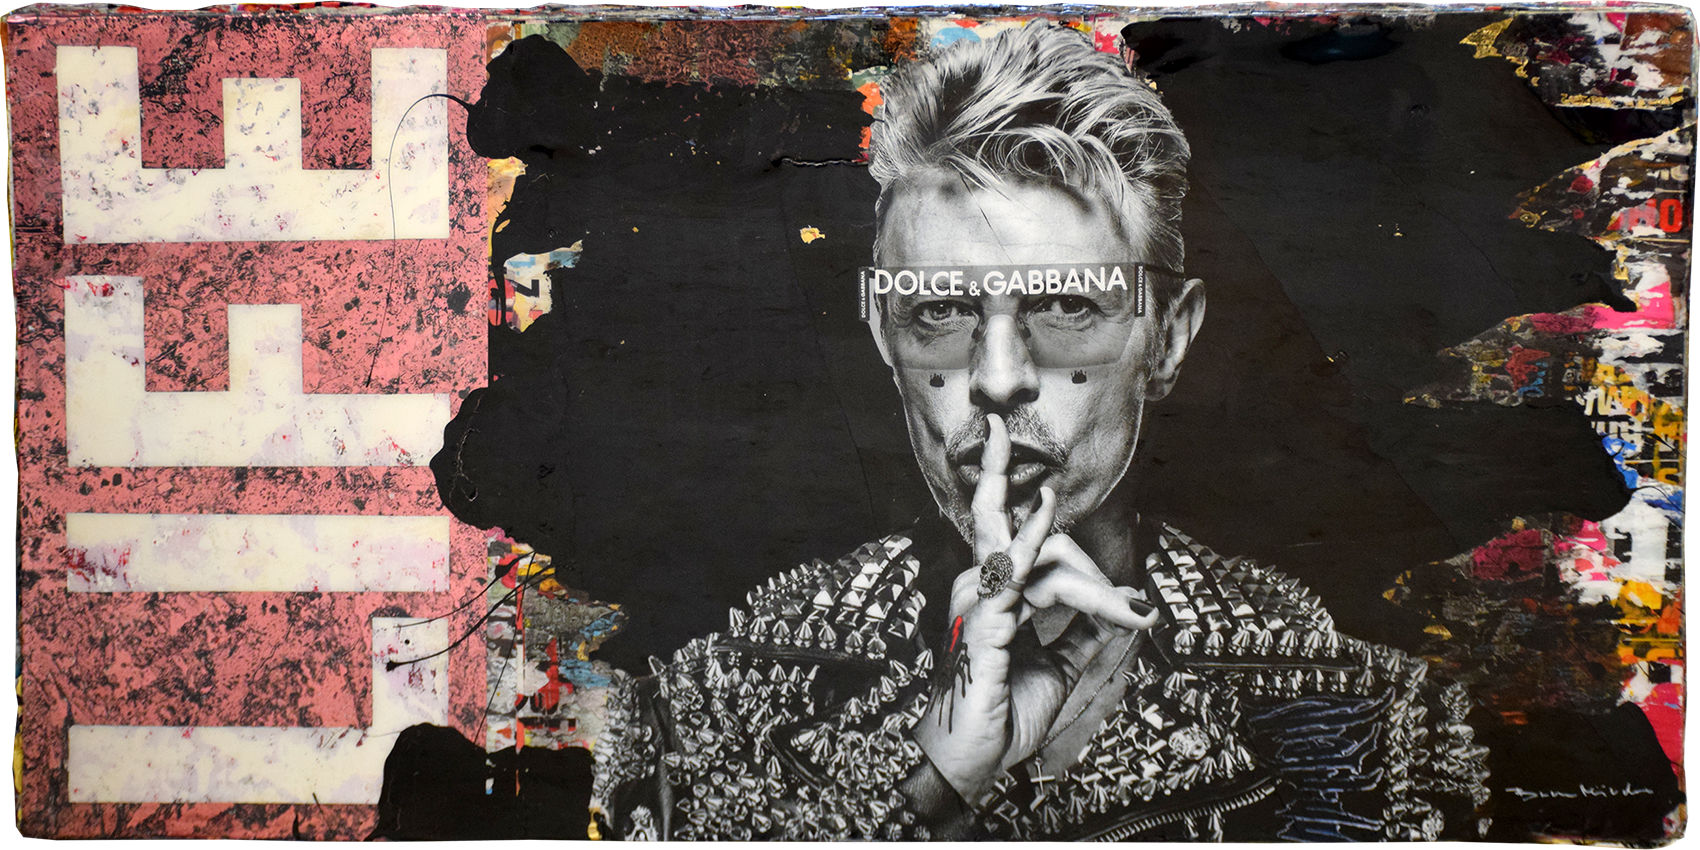 Bram Reijnders - What if ... Bowie , 8031-012-164